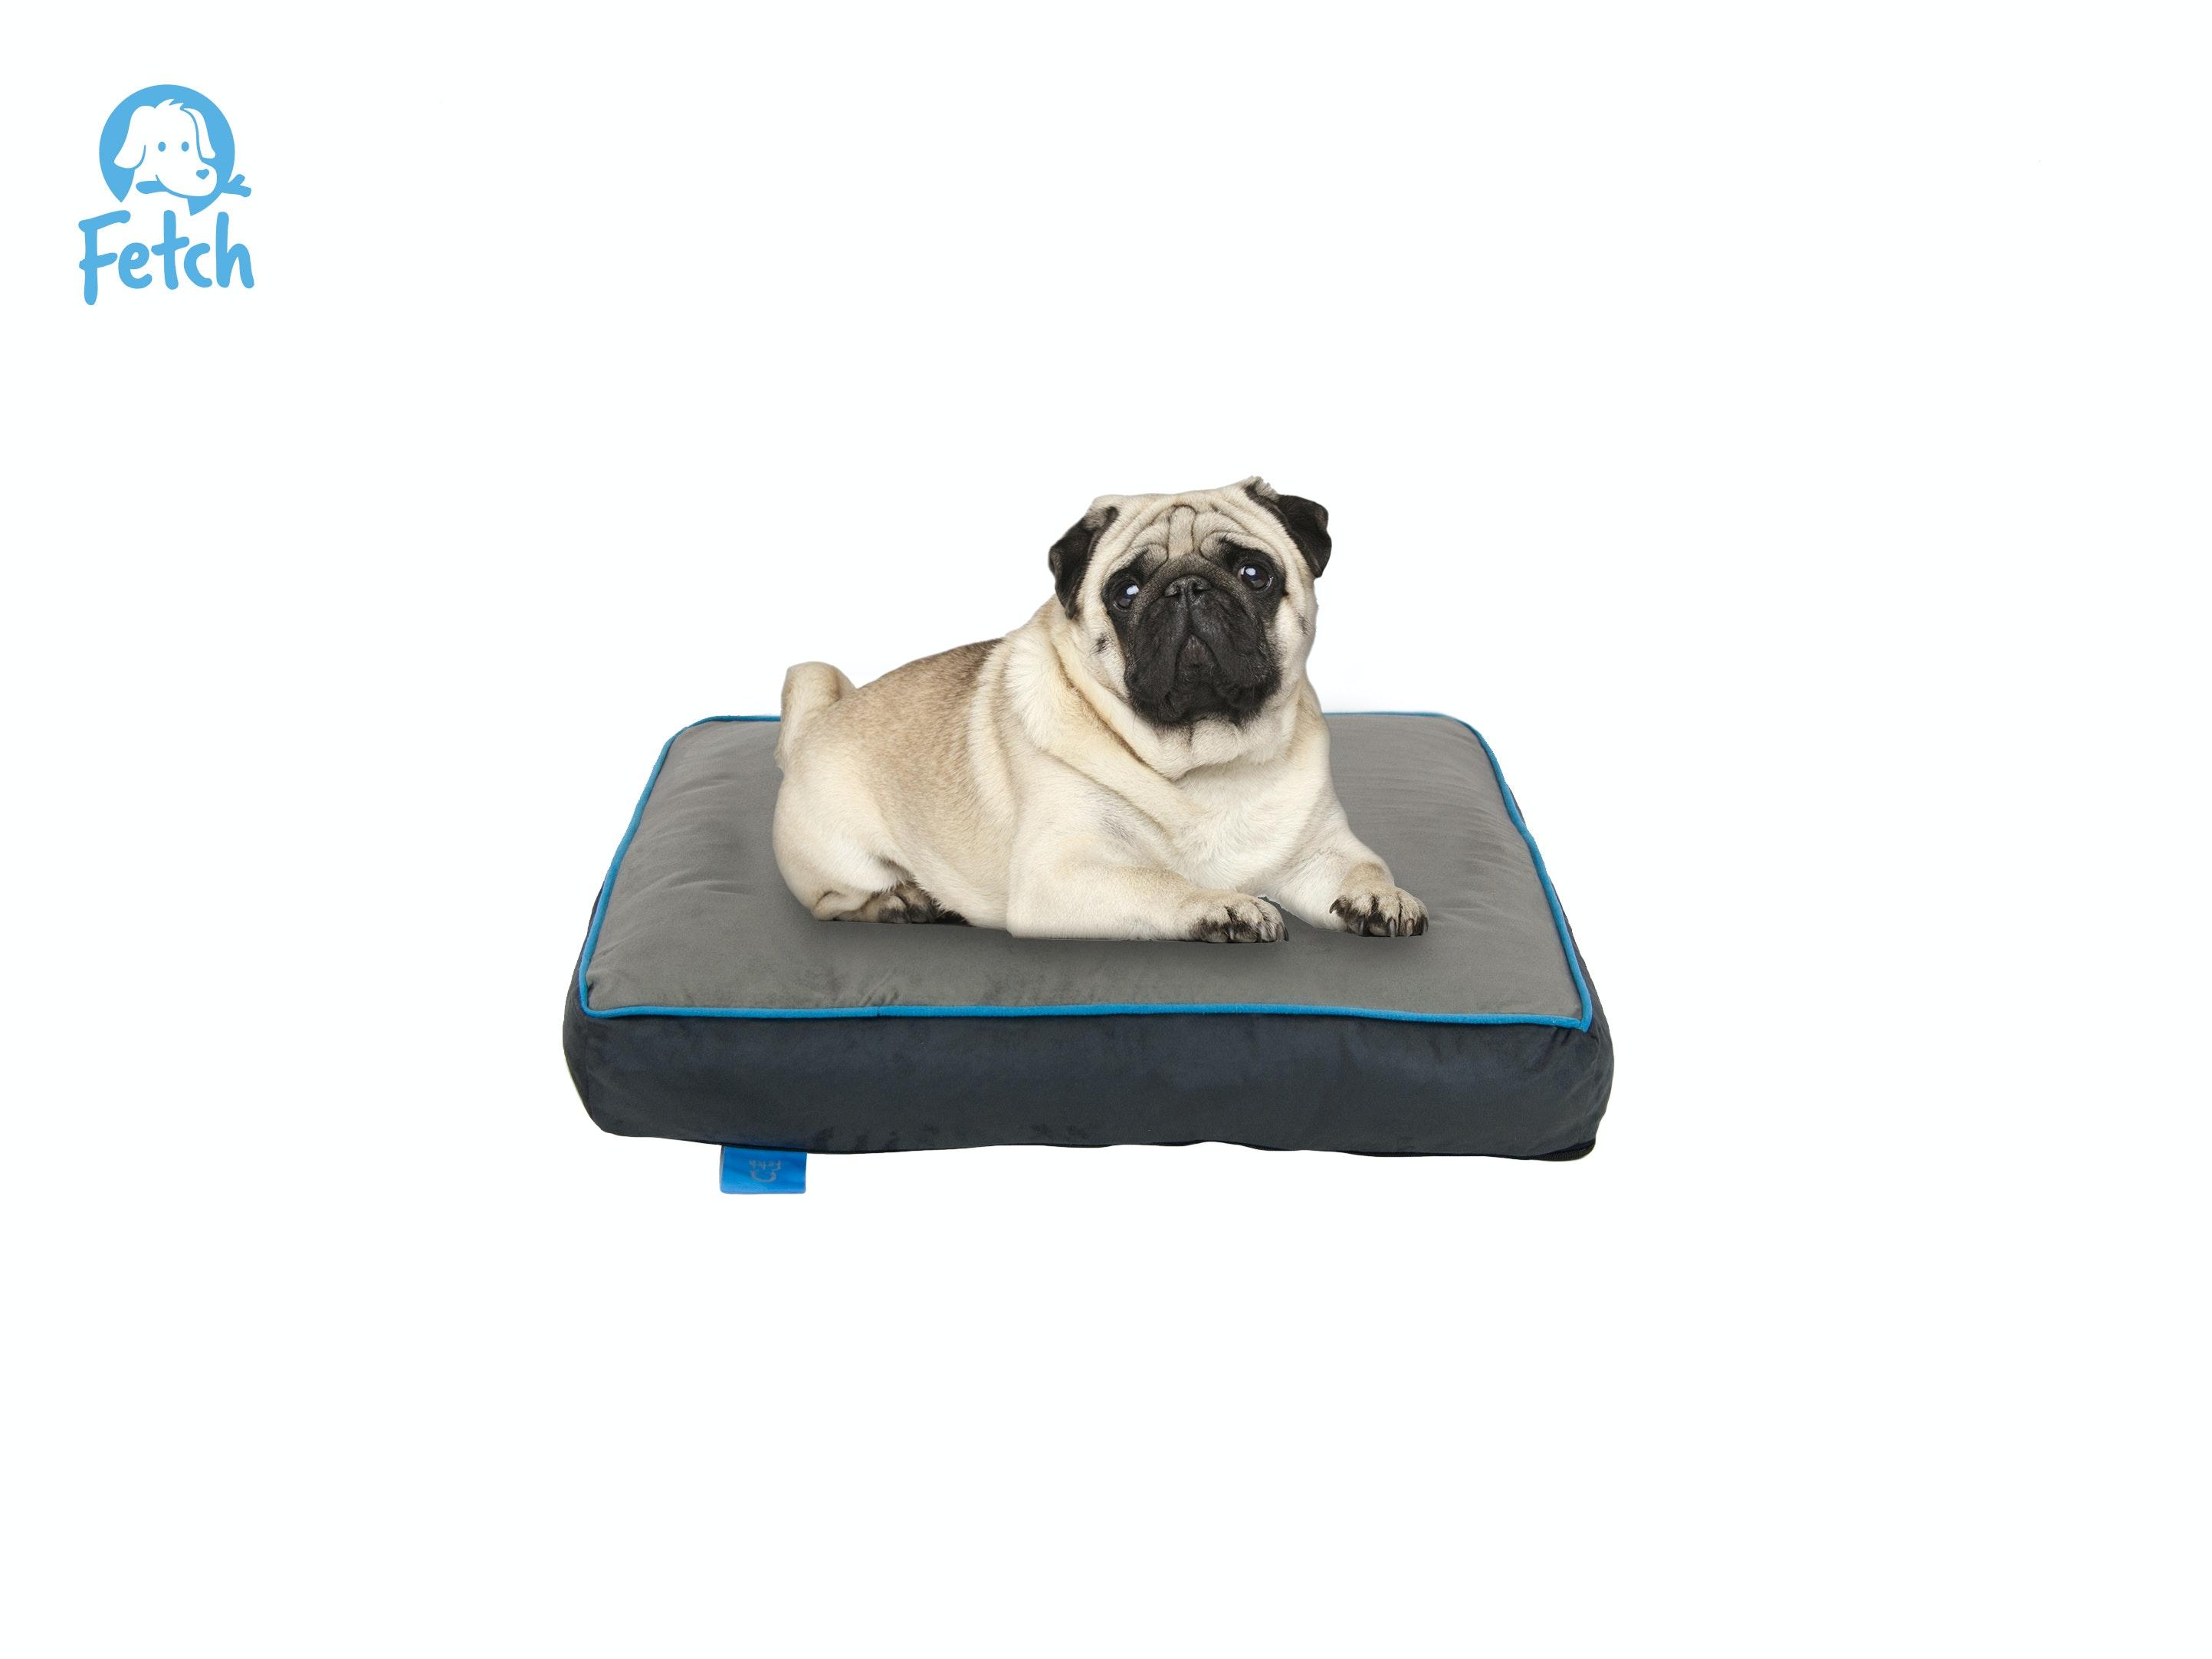 Fetch Orthopedic Memory Foam Dog Bed 12cm Thick - SML